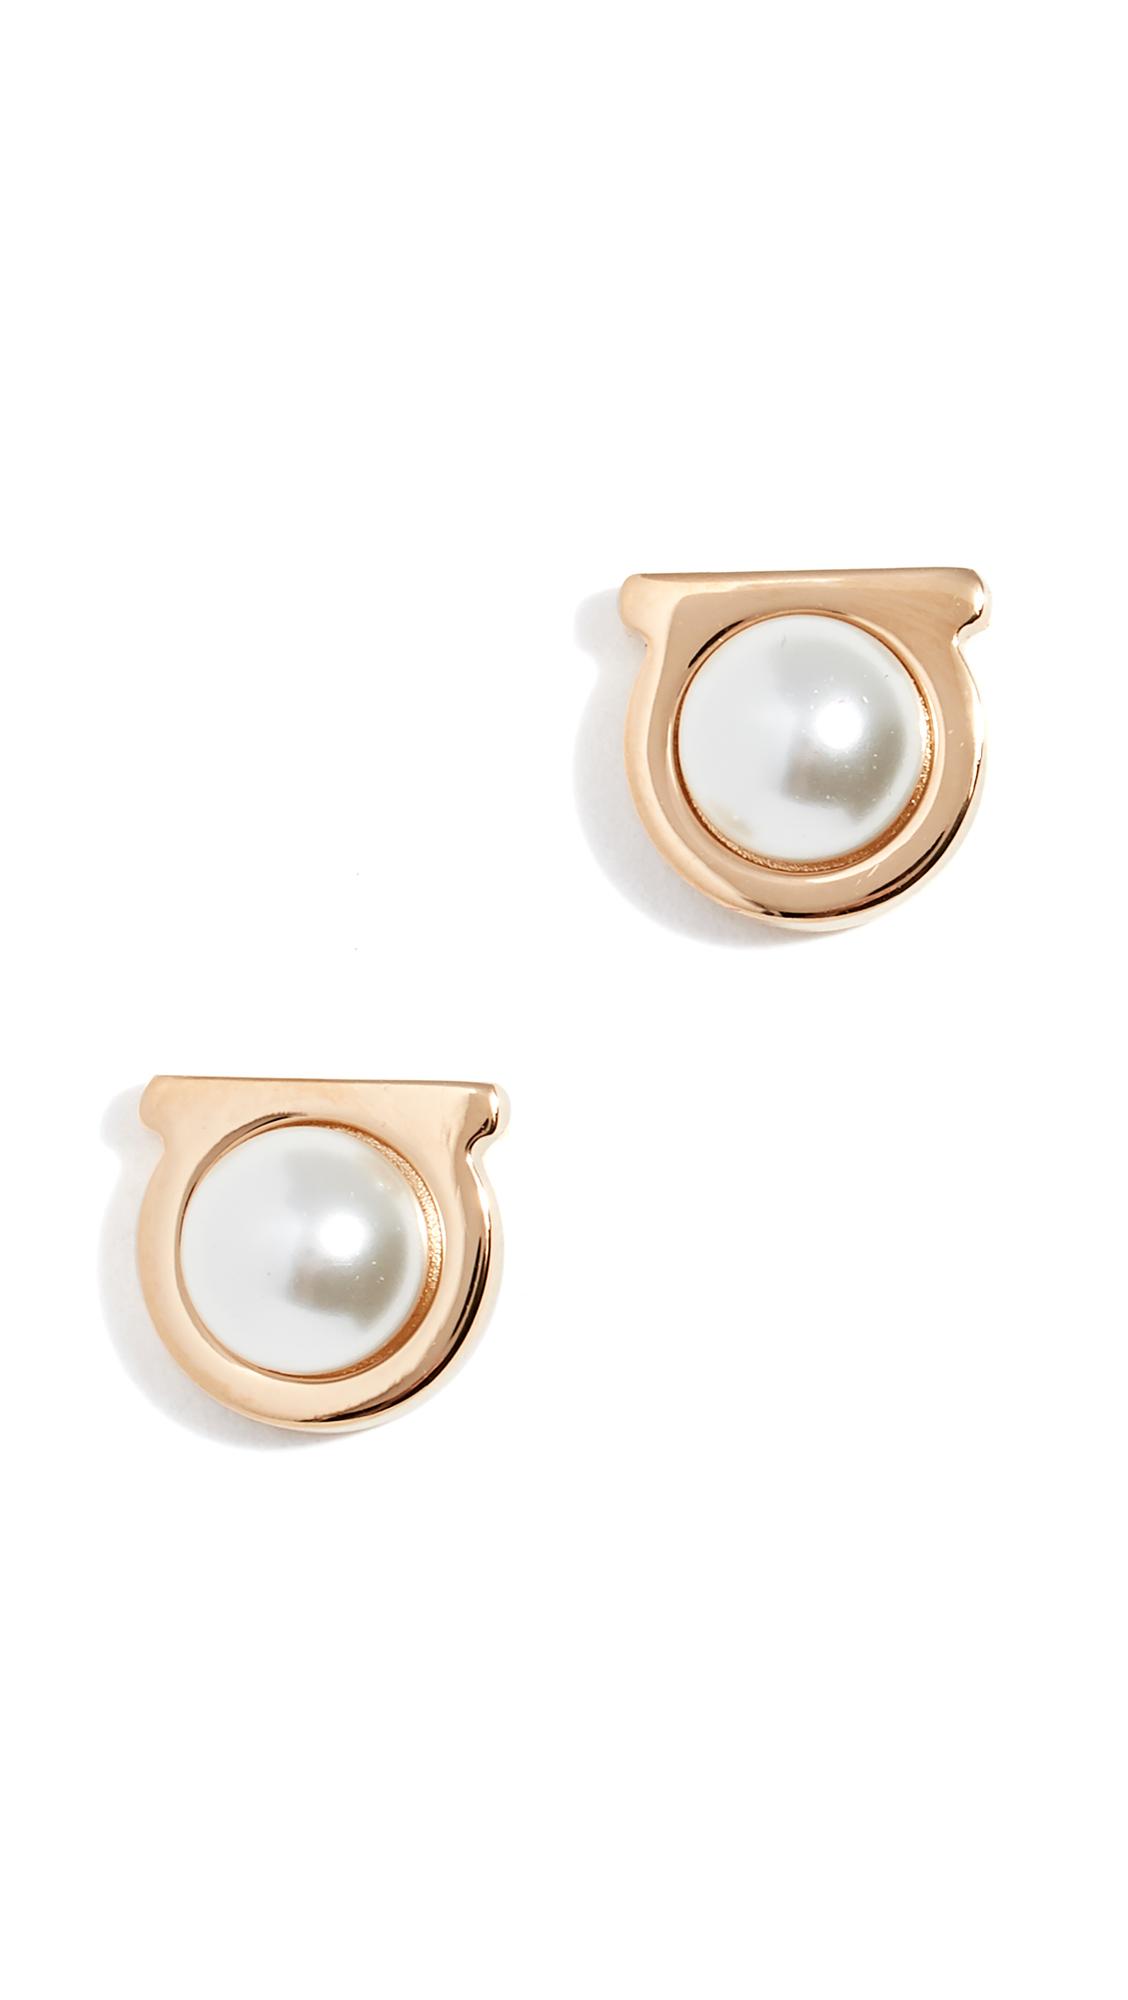 Salvatore Ferragamo Imitation Pearl Gancio Stud Earrings - Yellow Gold